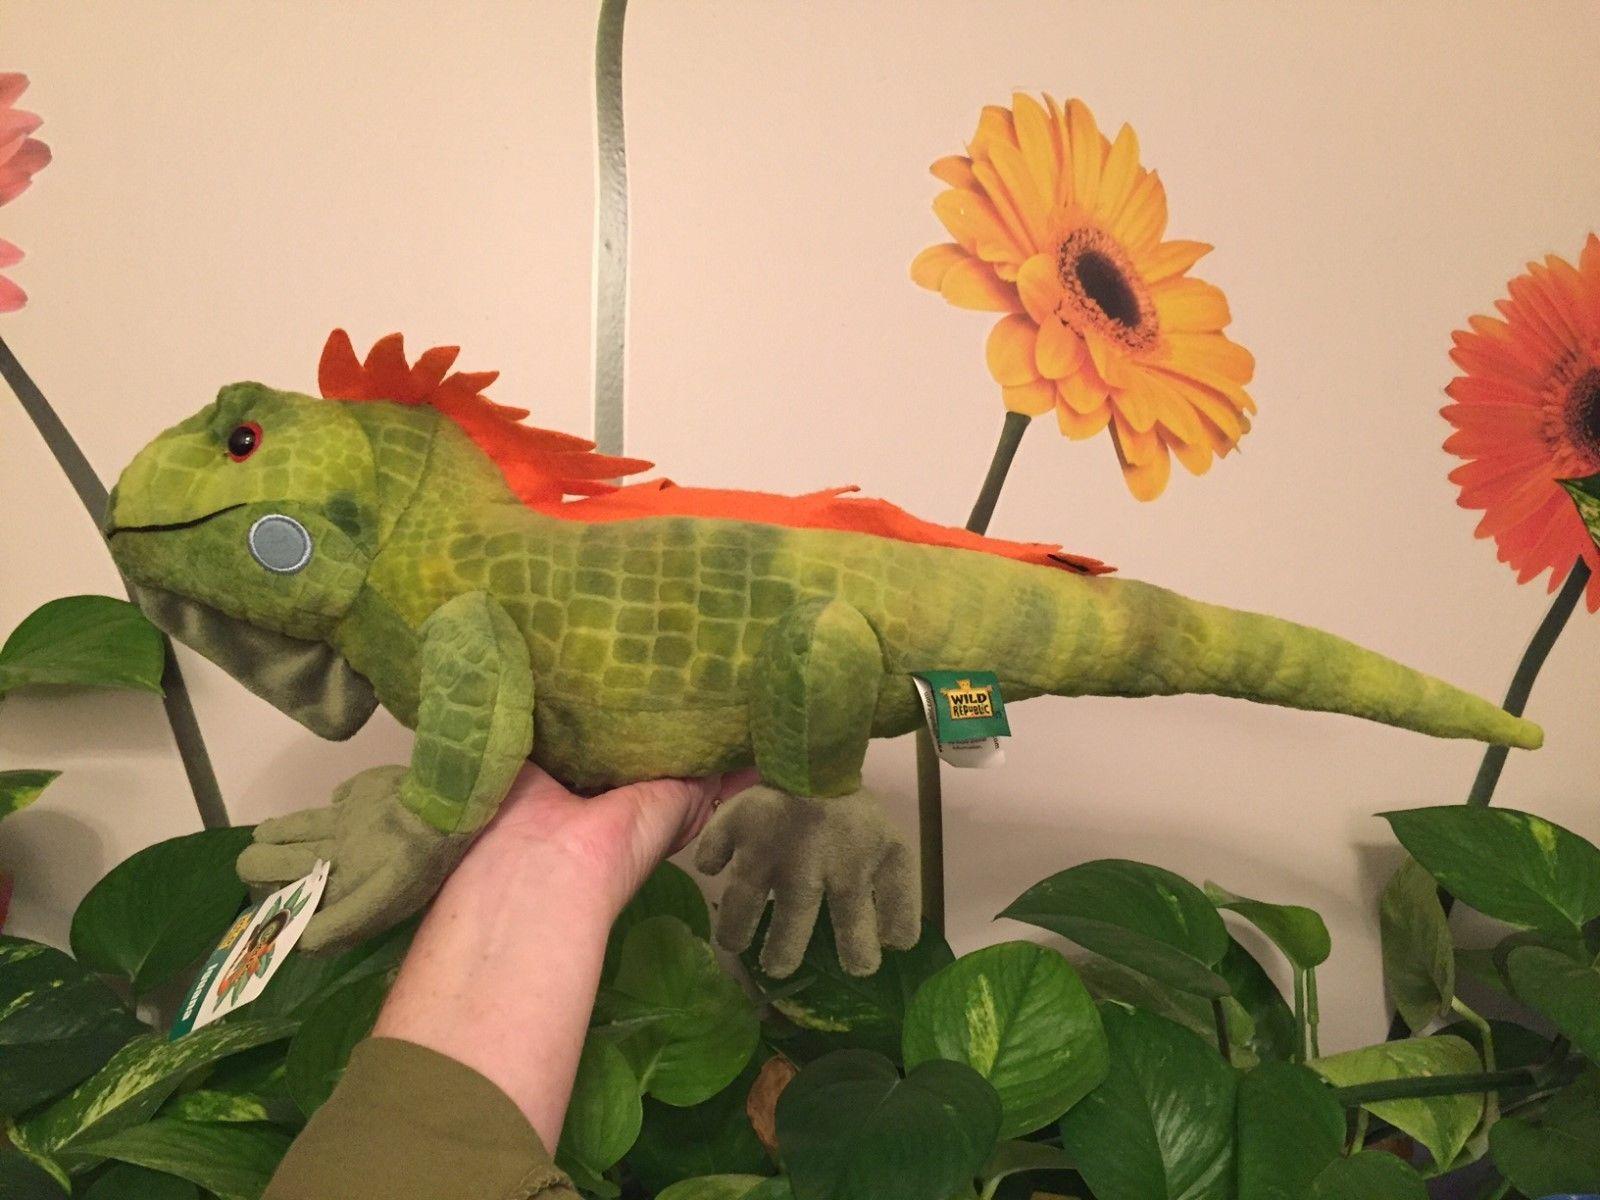 Stuffed Iguana by Wild Republic 23 Inches Style 12905 | eBay